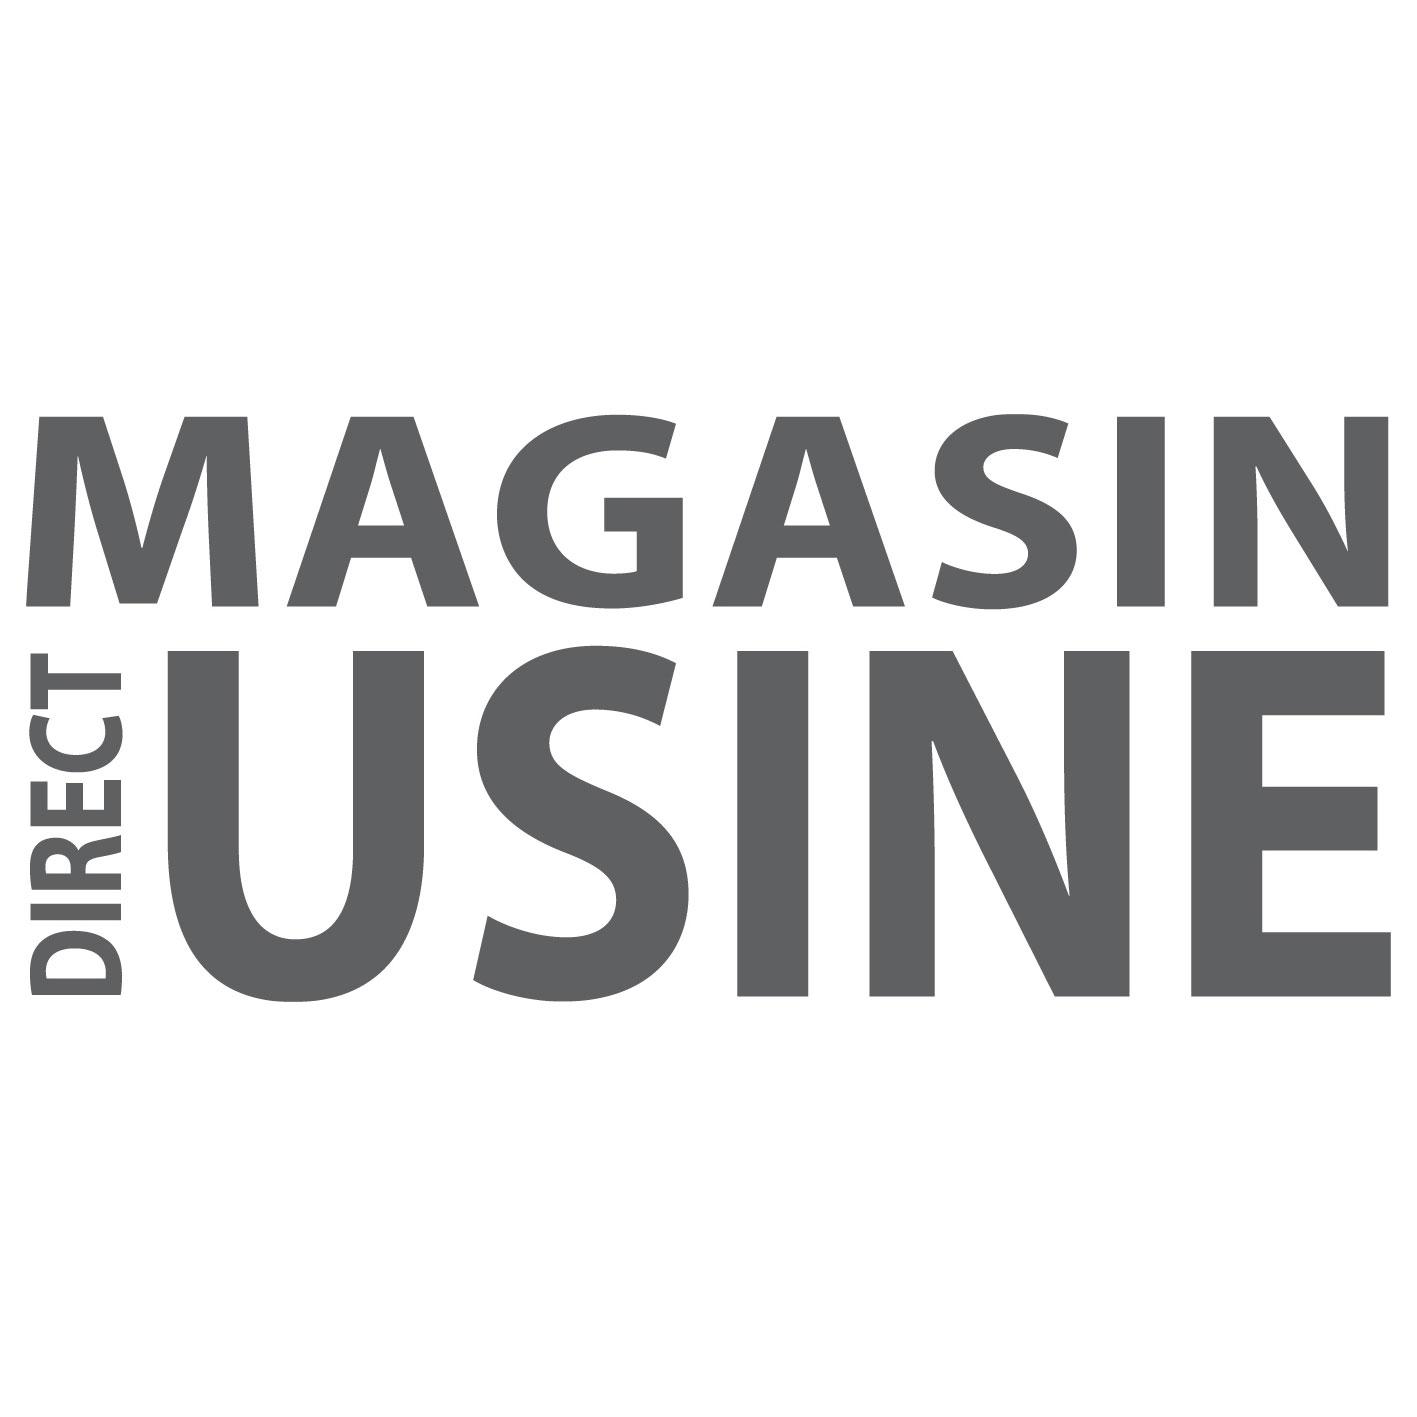 Magasin Direct Usine Sarbec